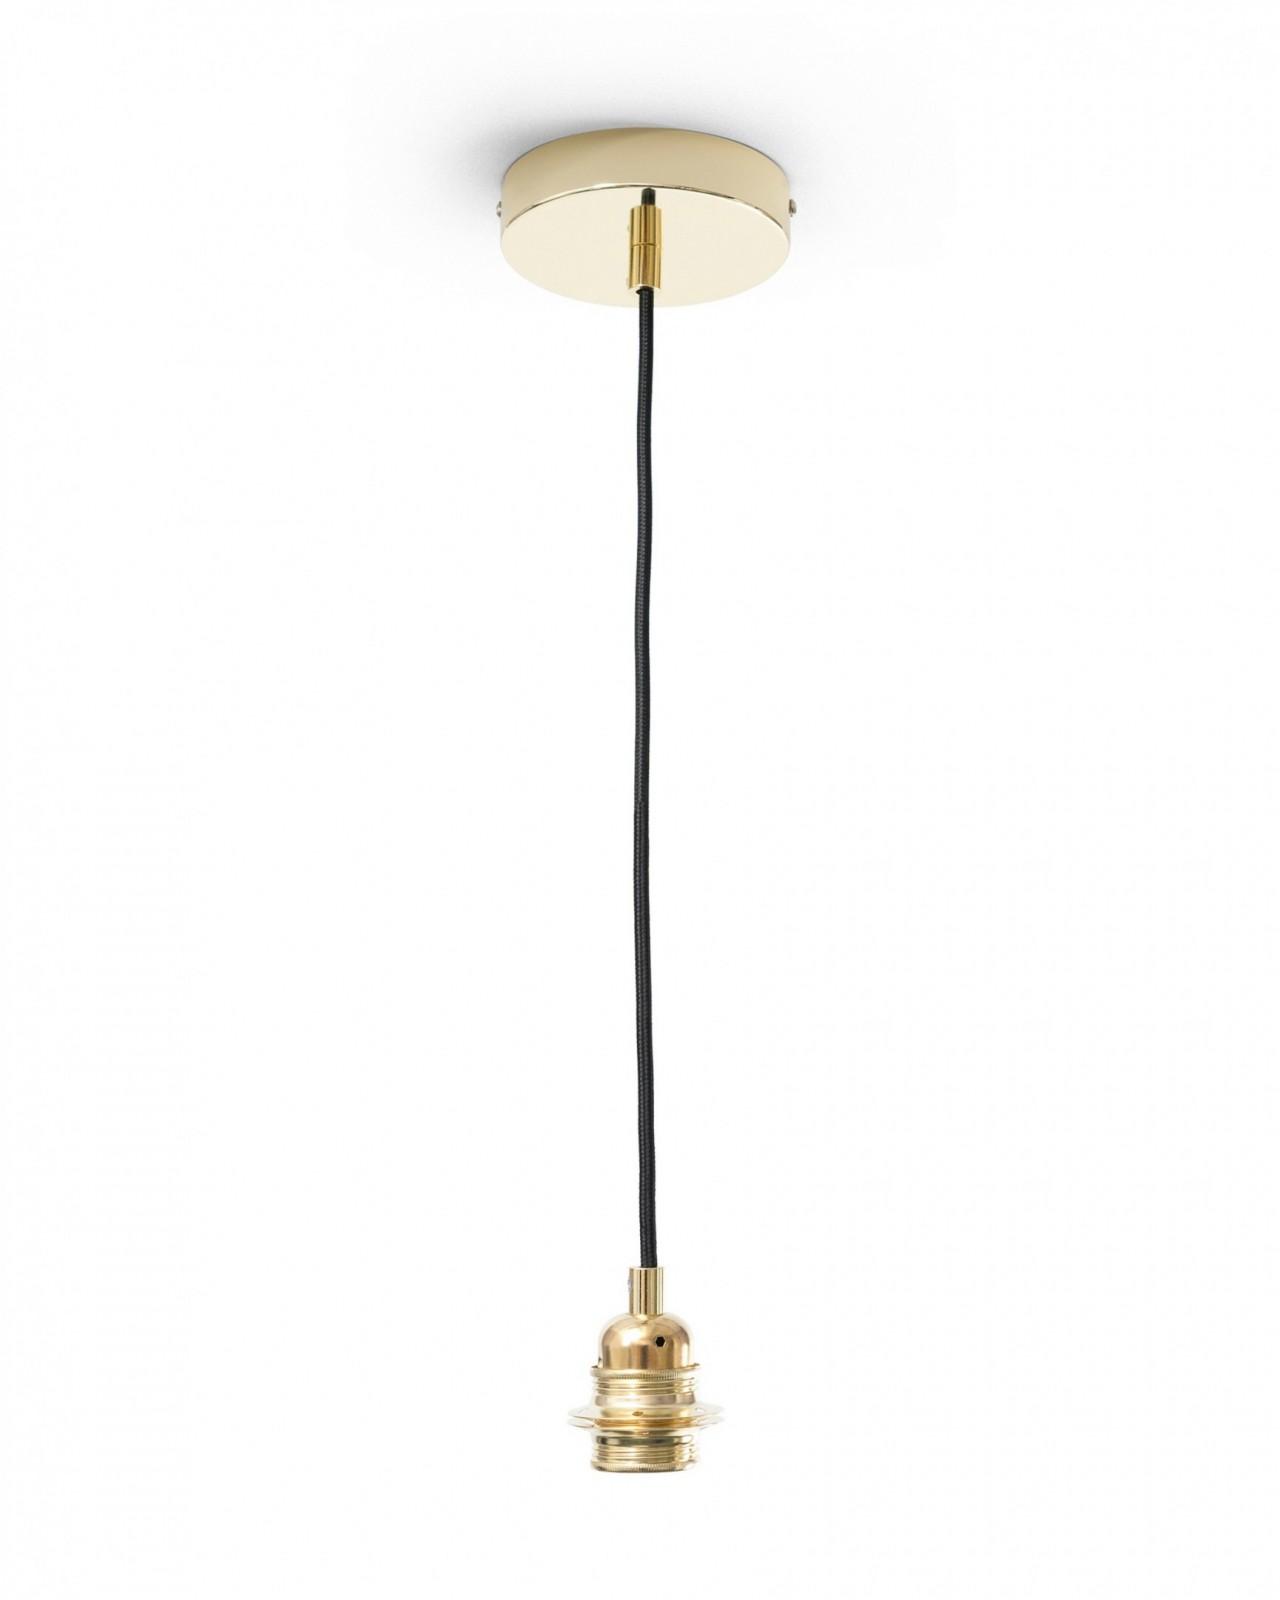 HINDUSTAN Anthracite Pendant Lamp